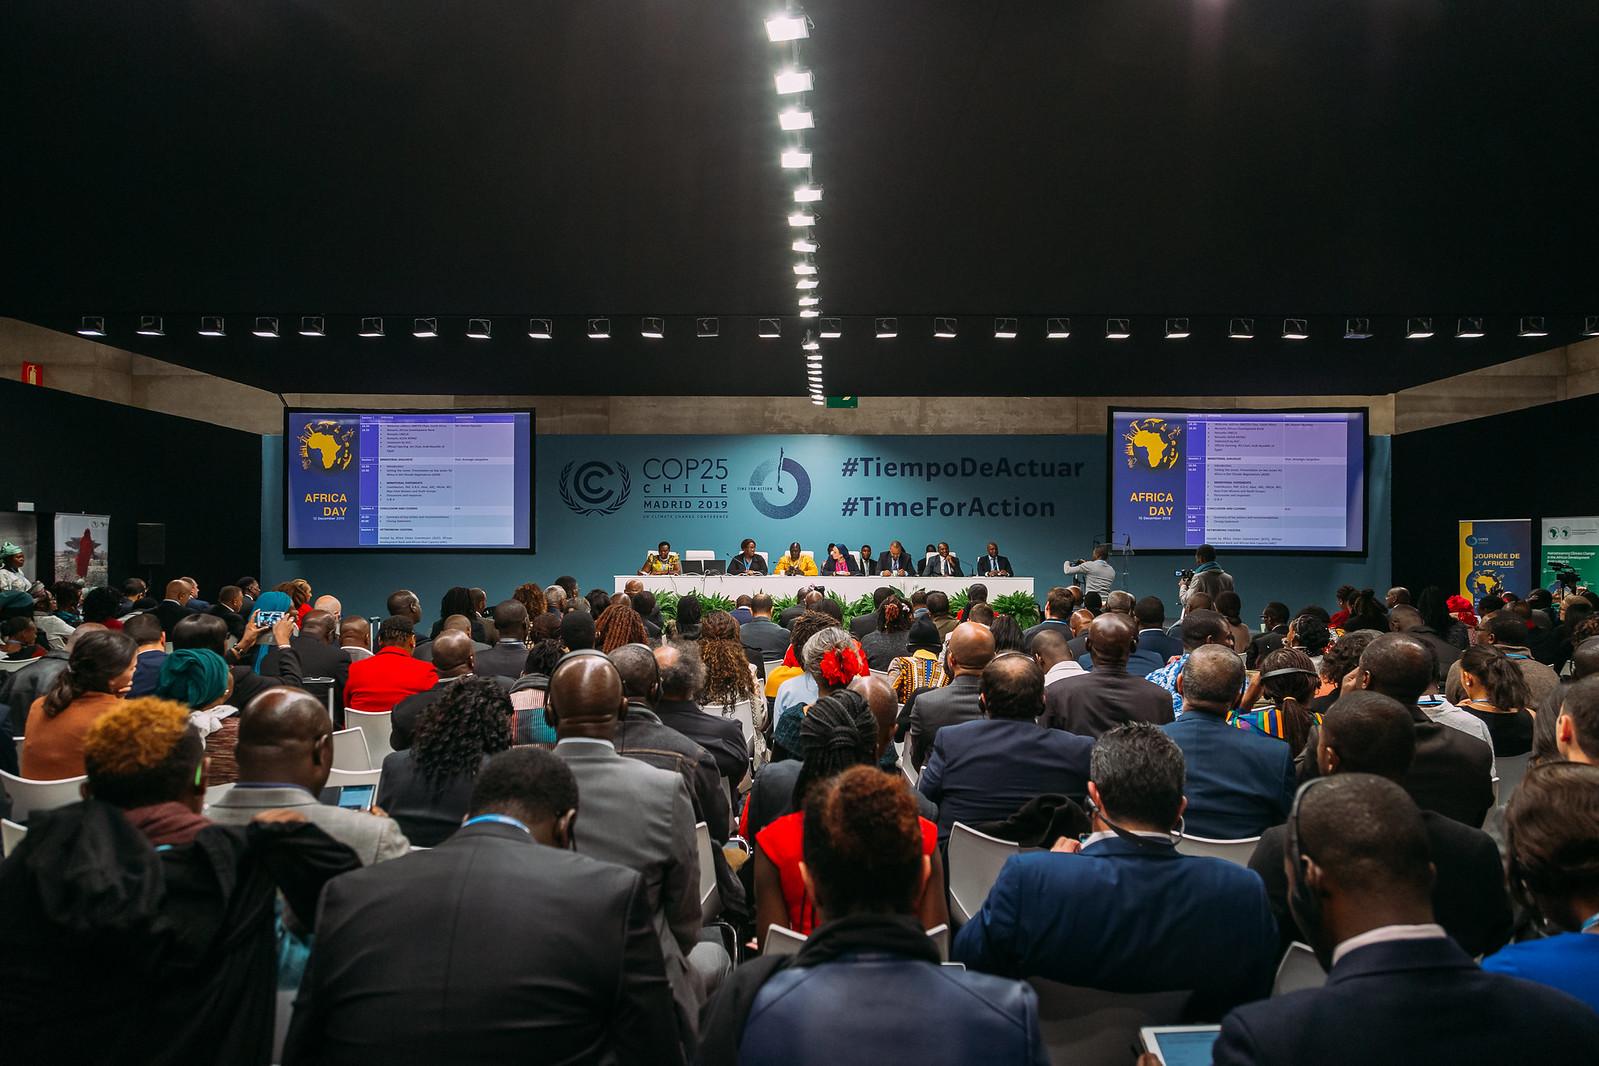 COP25 – Africa Day – 10 December 2019